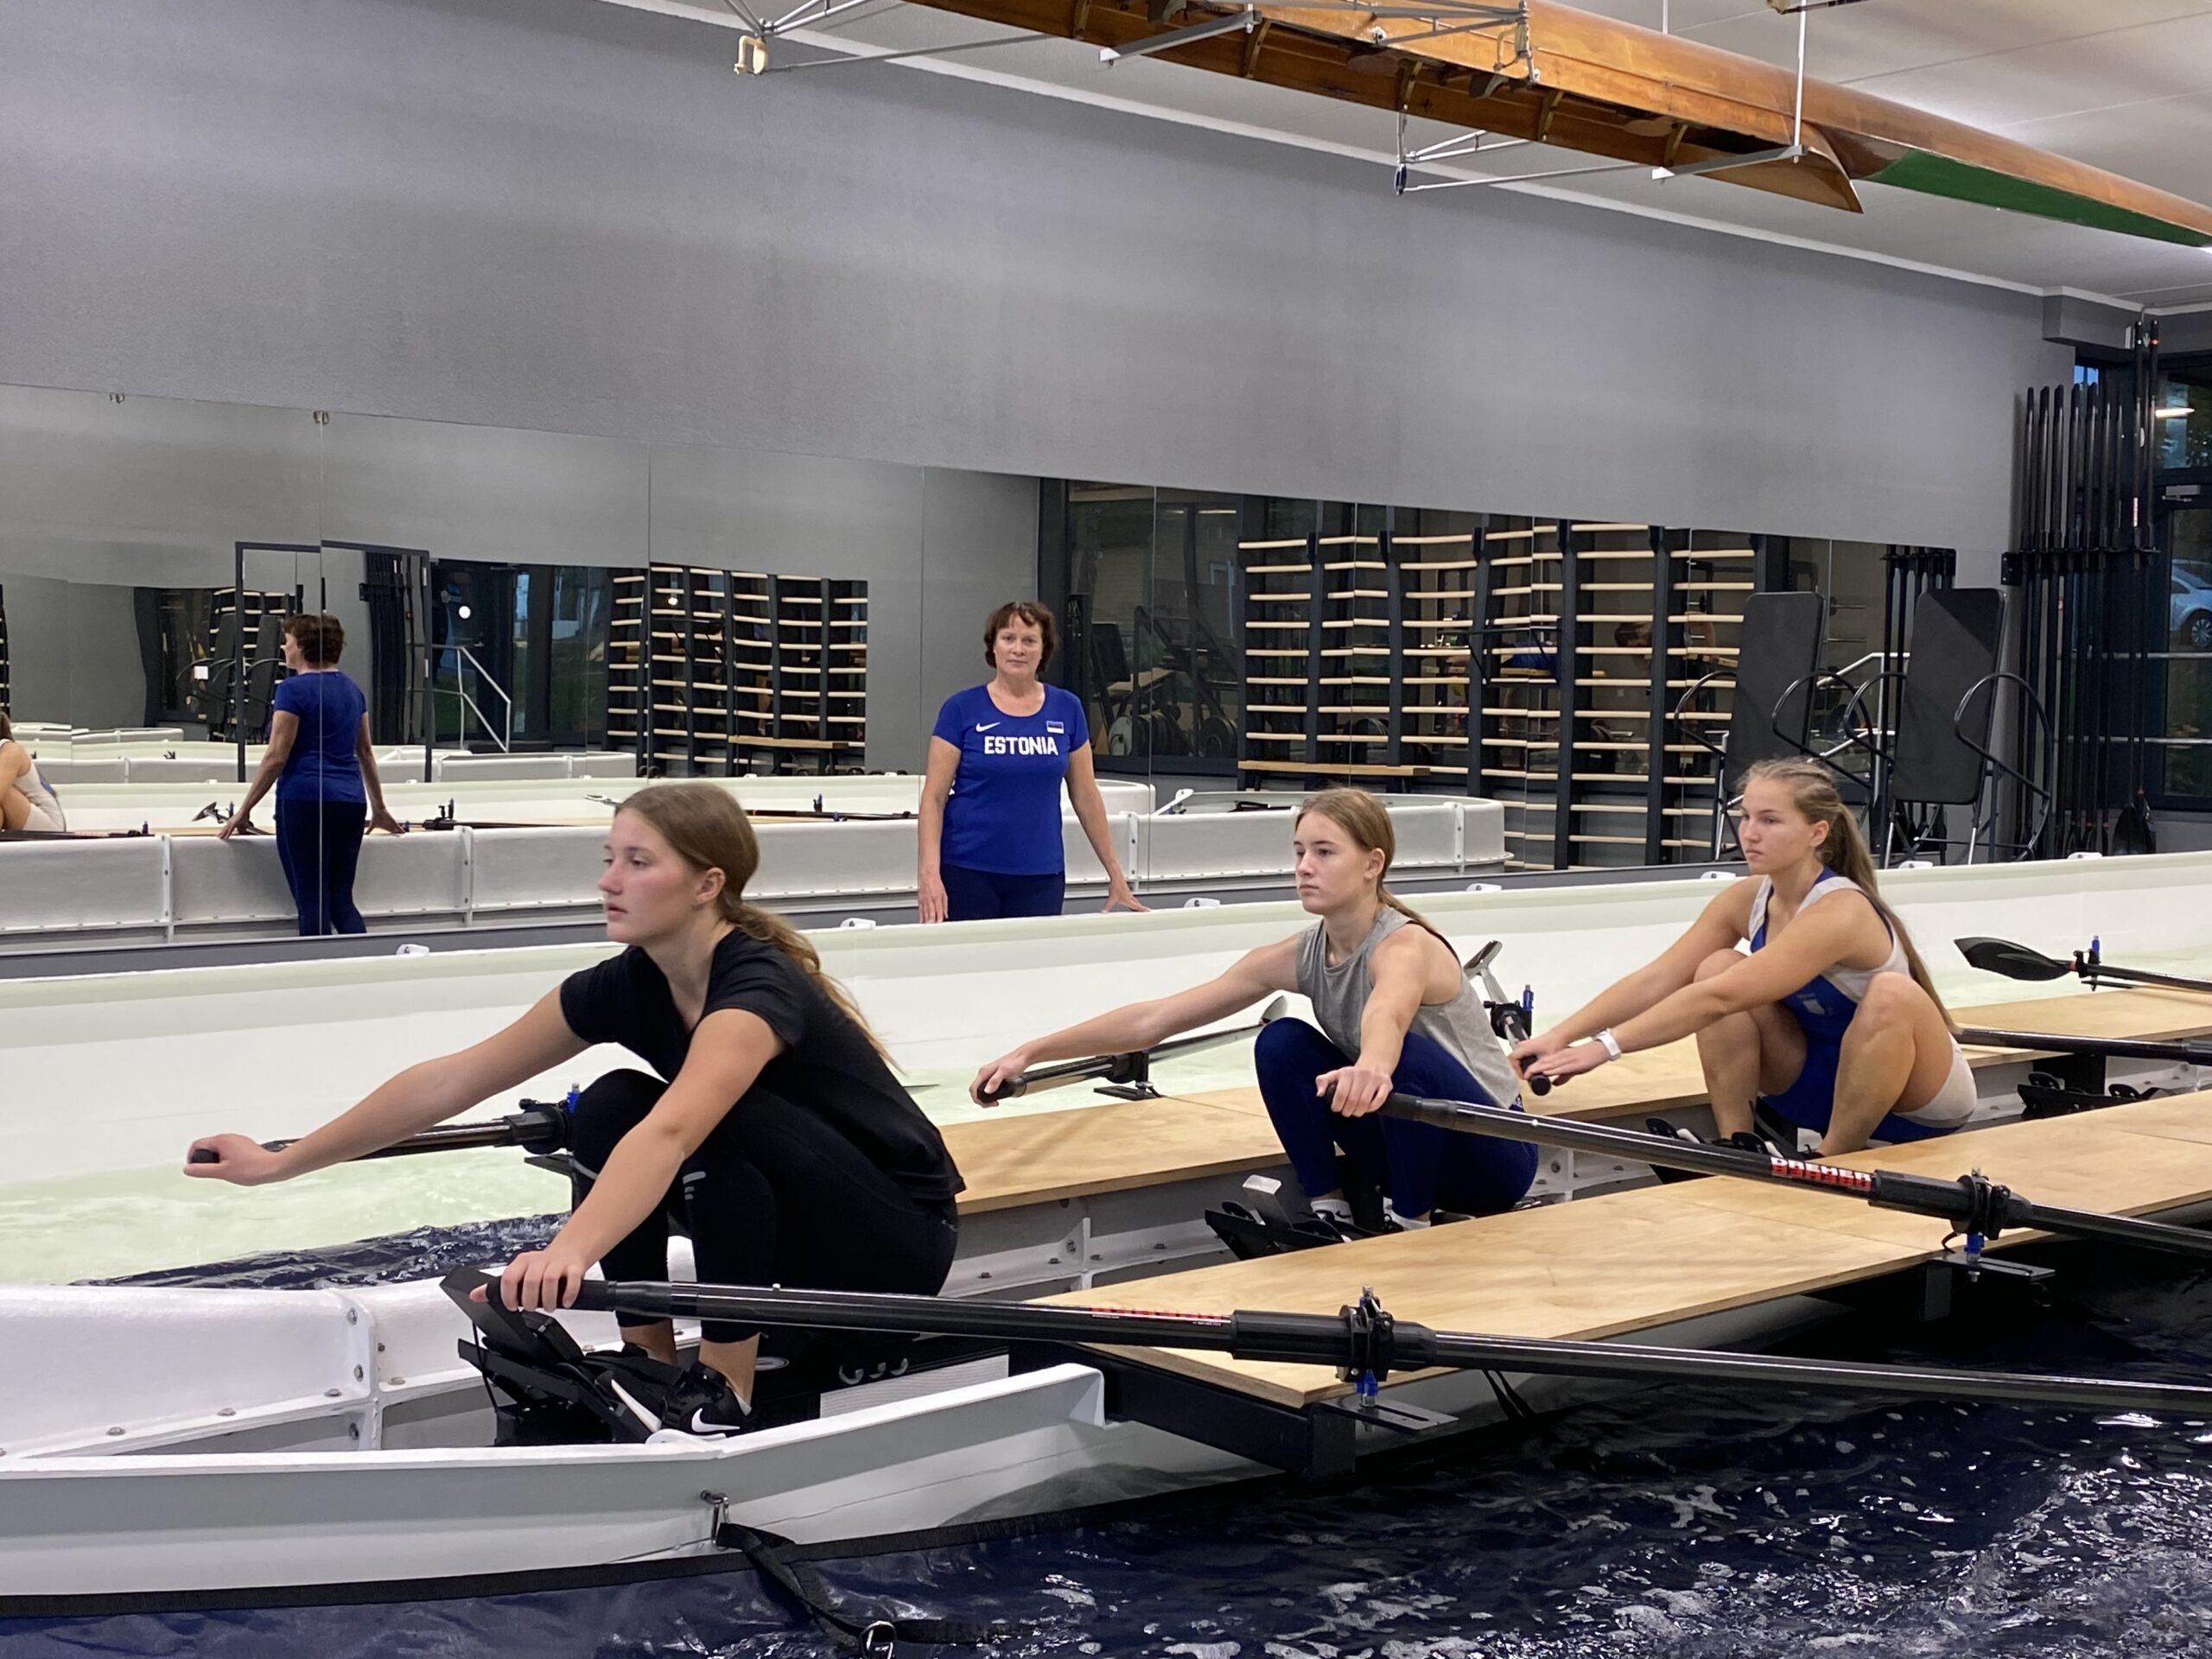 https://www.rowing.ee/wp-content/uploads/2020/12/Soudjad-scaled.jpg